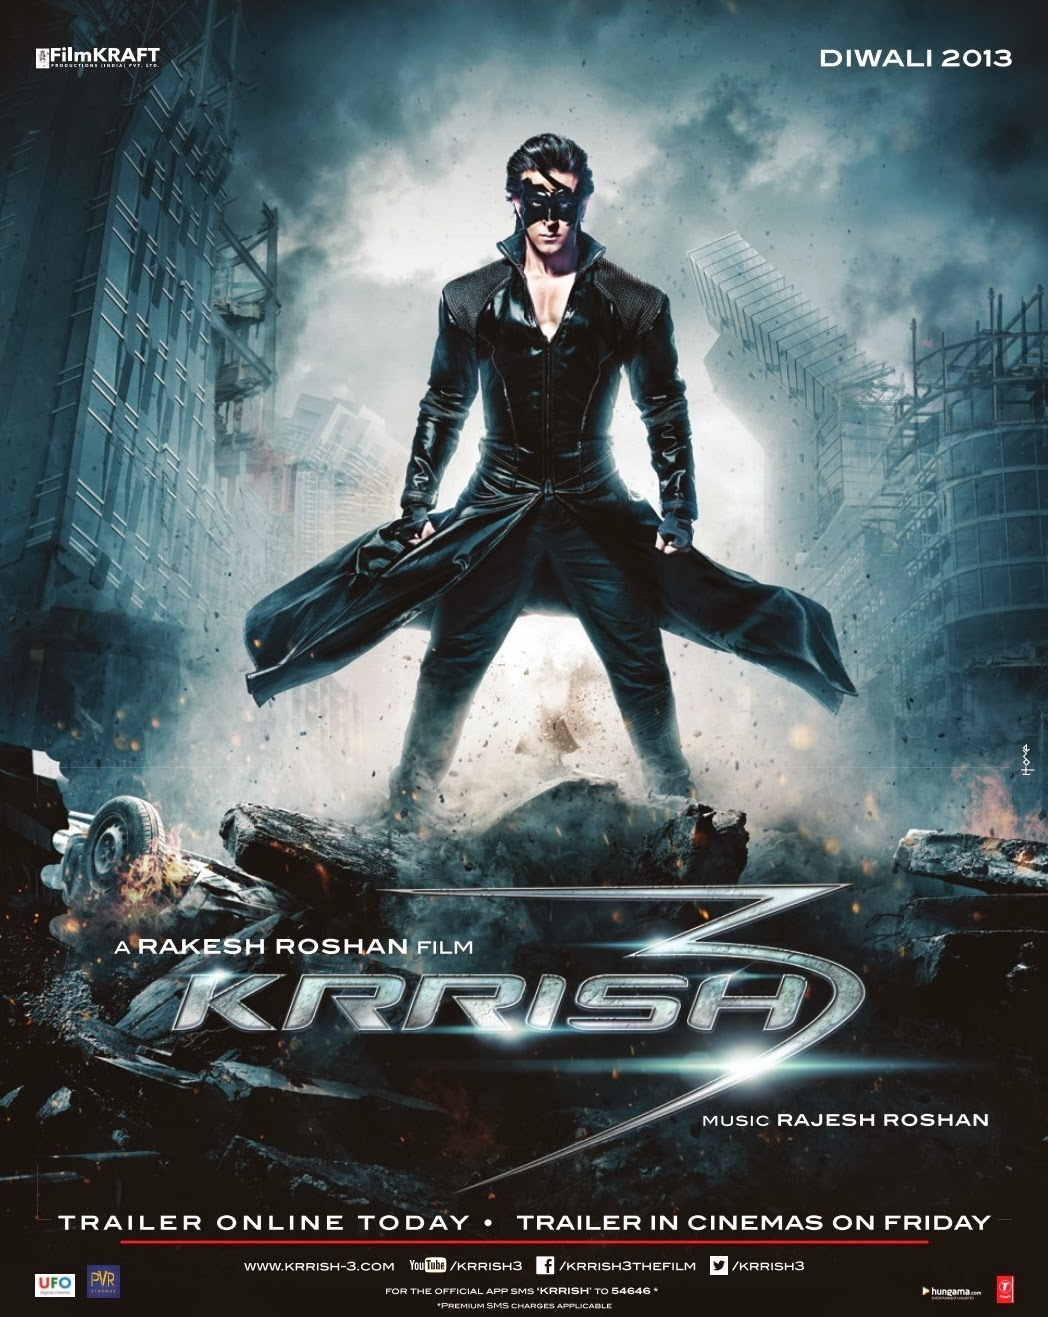 Watch Krrish 3 Tamil Dubbed Movie OnlineDVD  RAJTAMIL